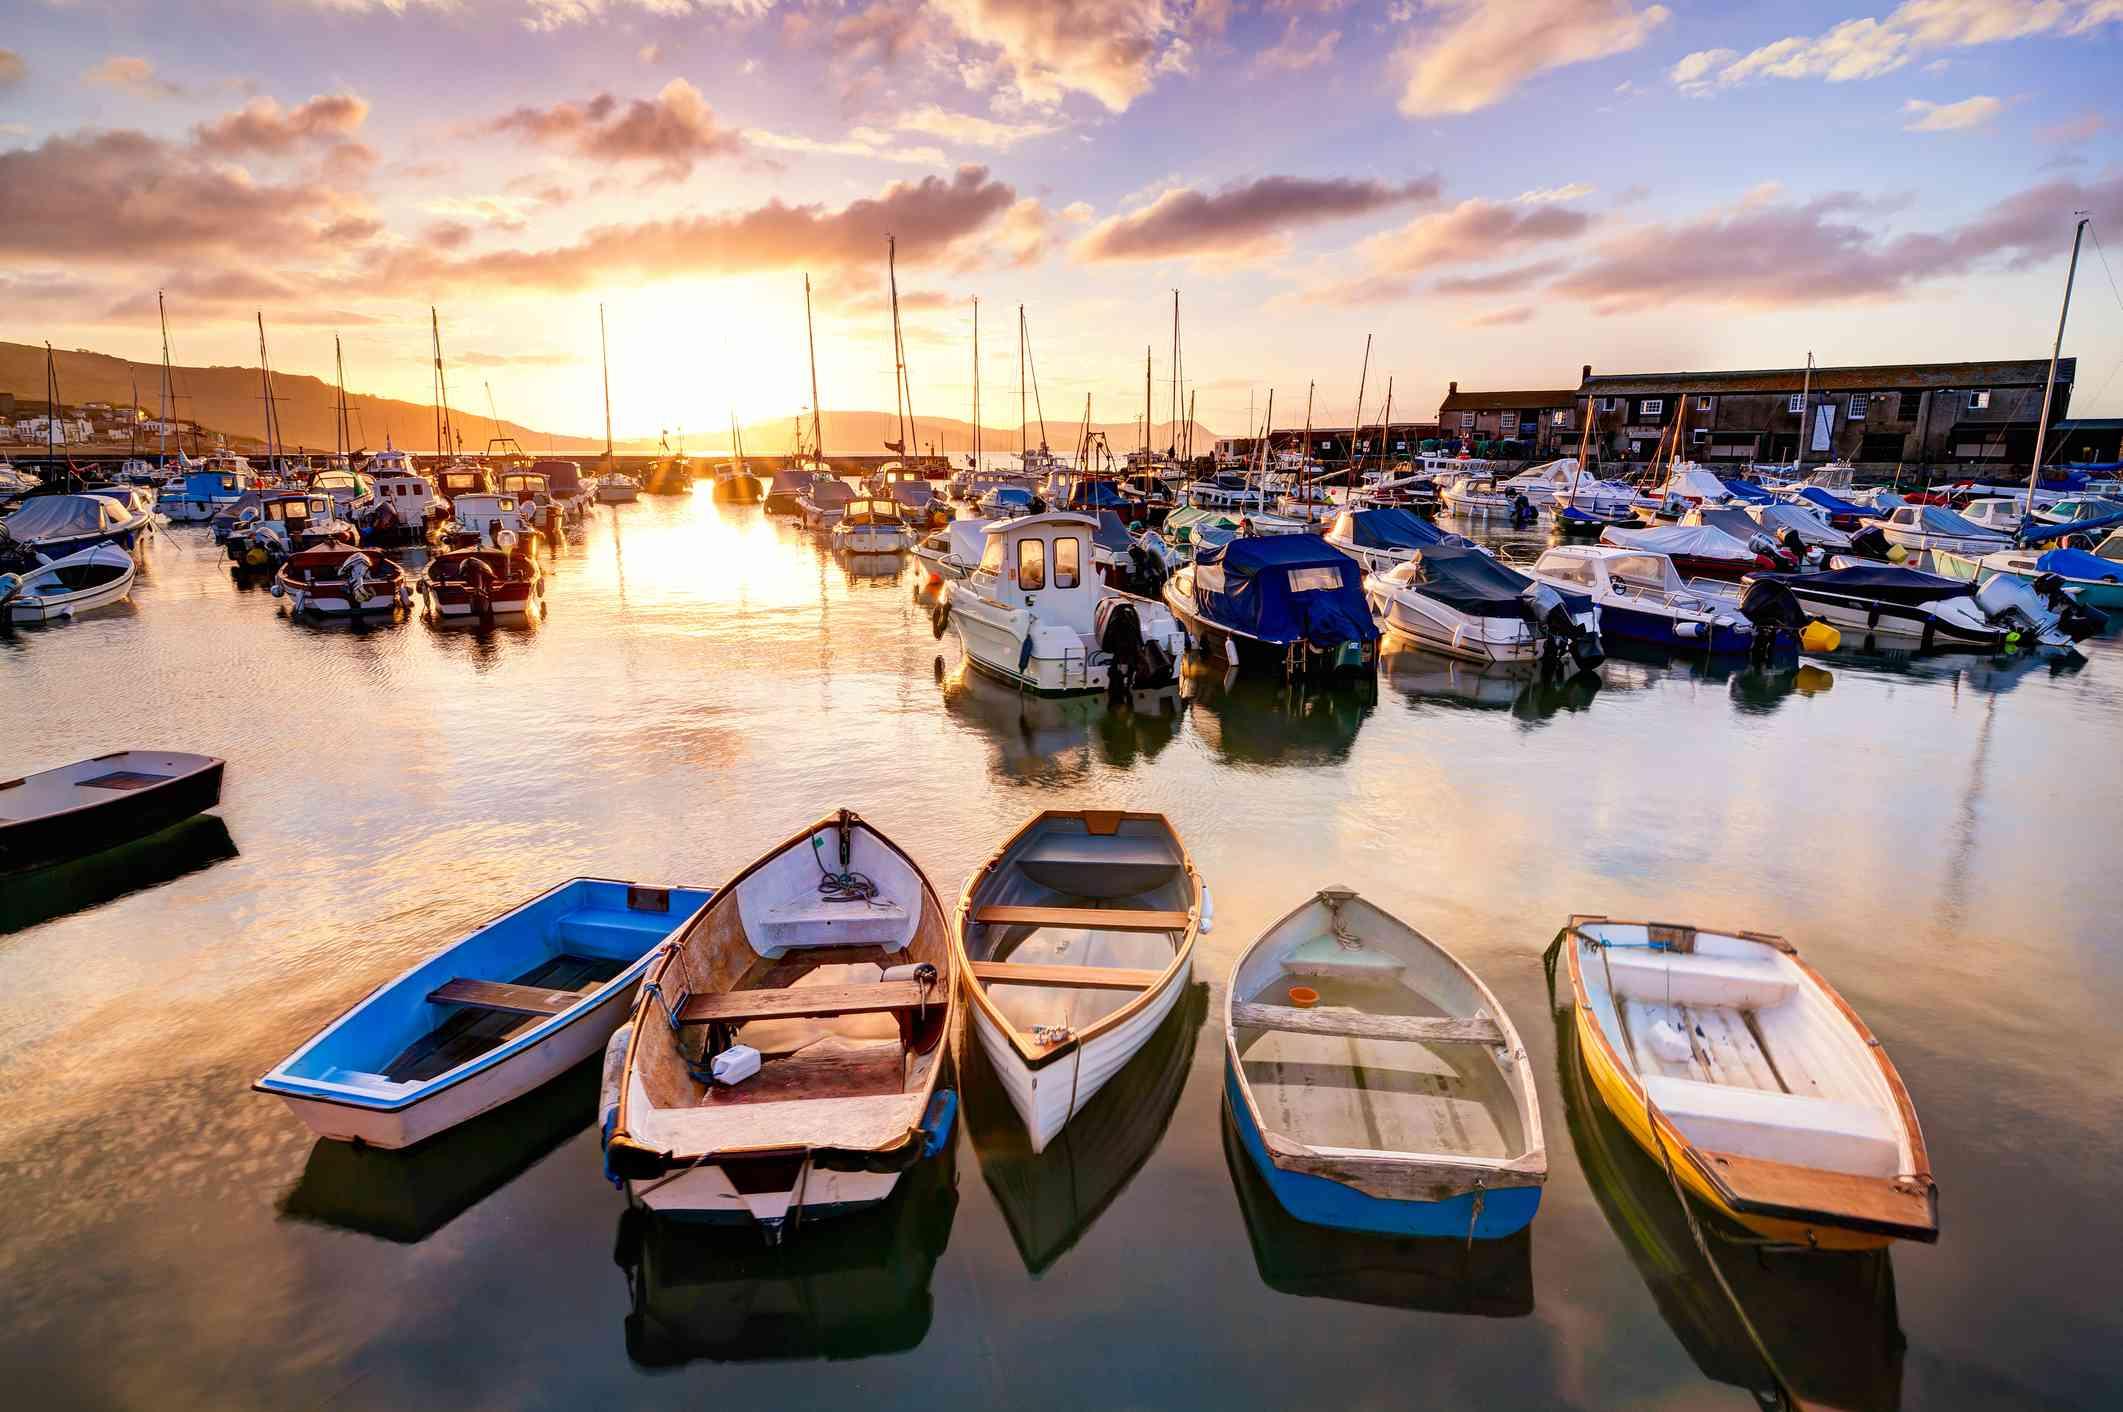 Dozens of boats at Lyme Regis Harbour at Sunrise